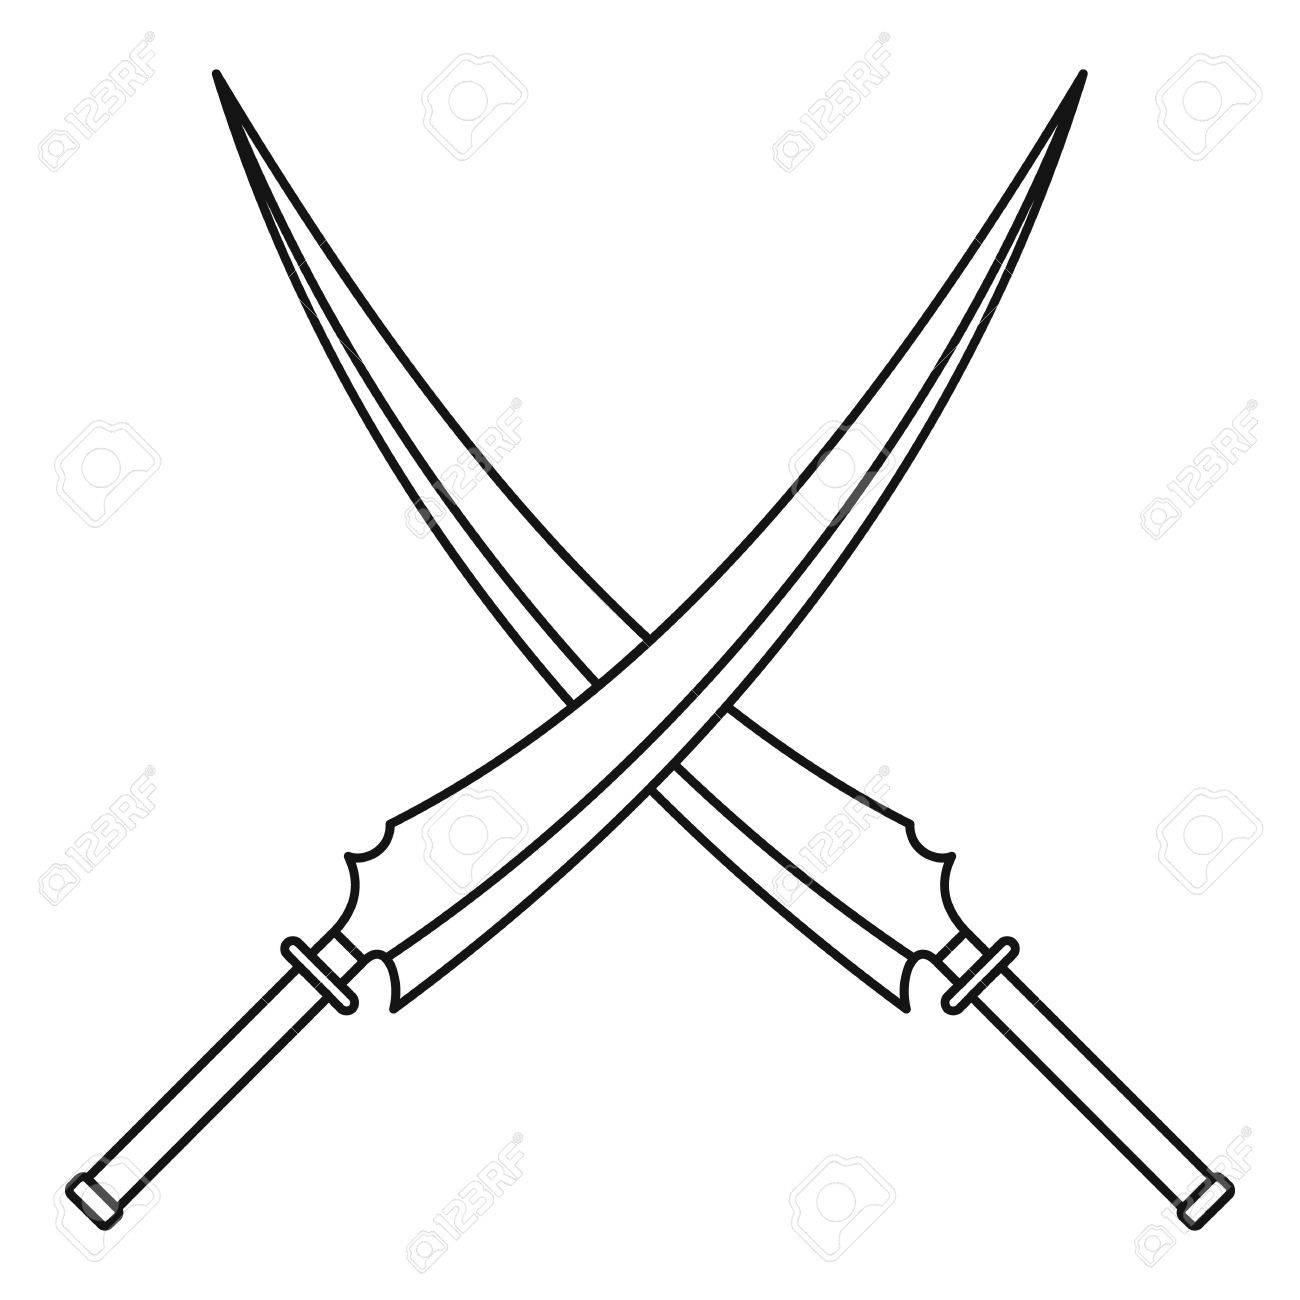 Simple Sword Drawing At Getdrawings